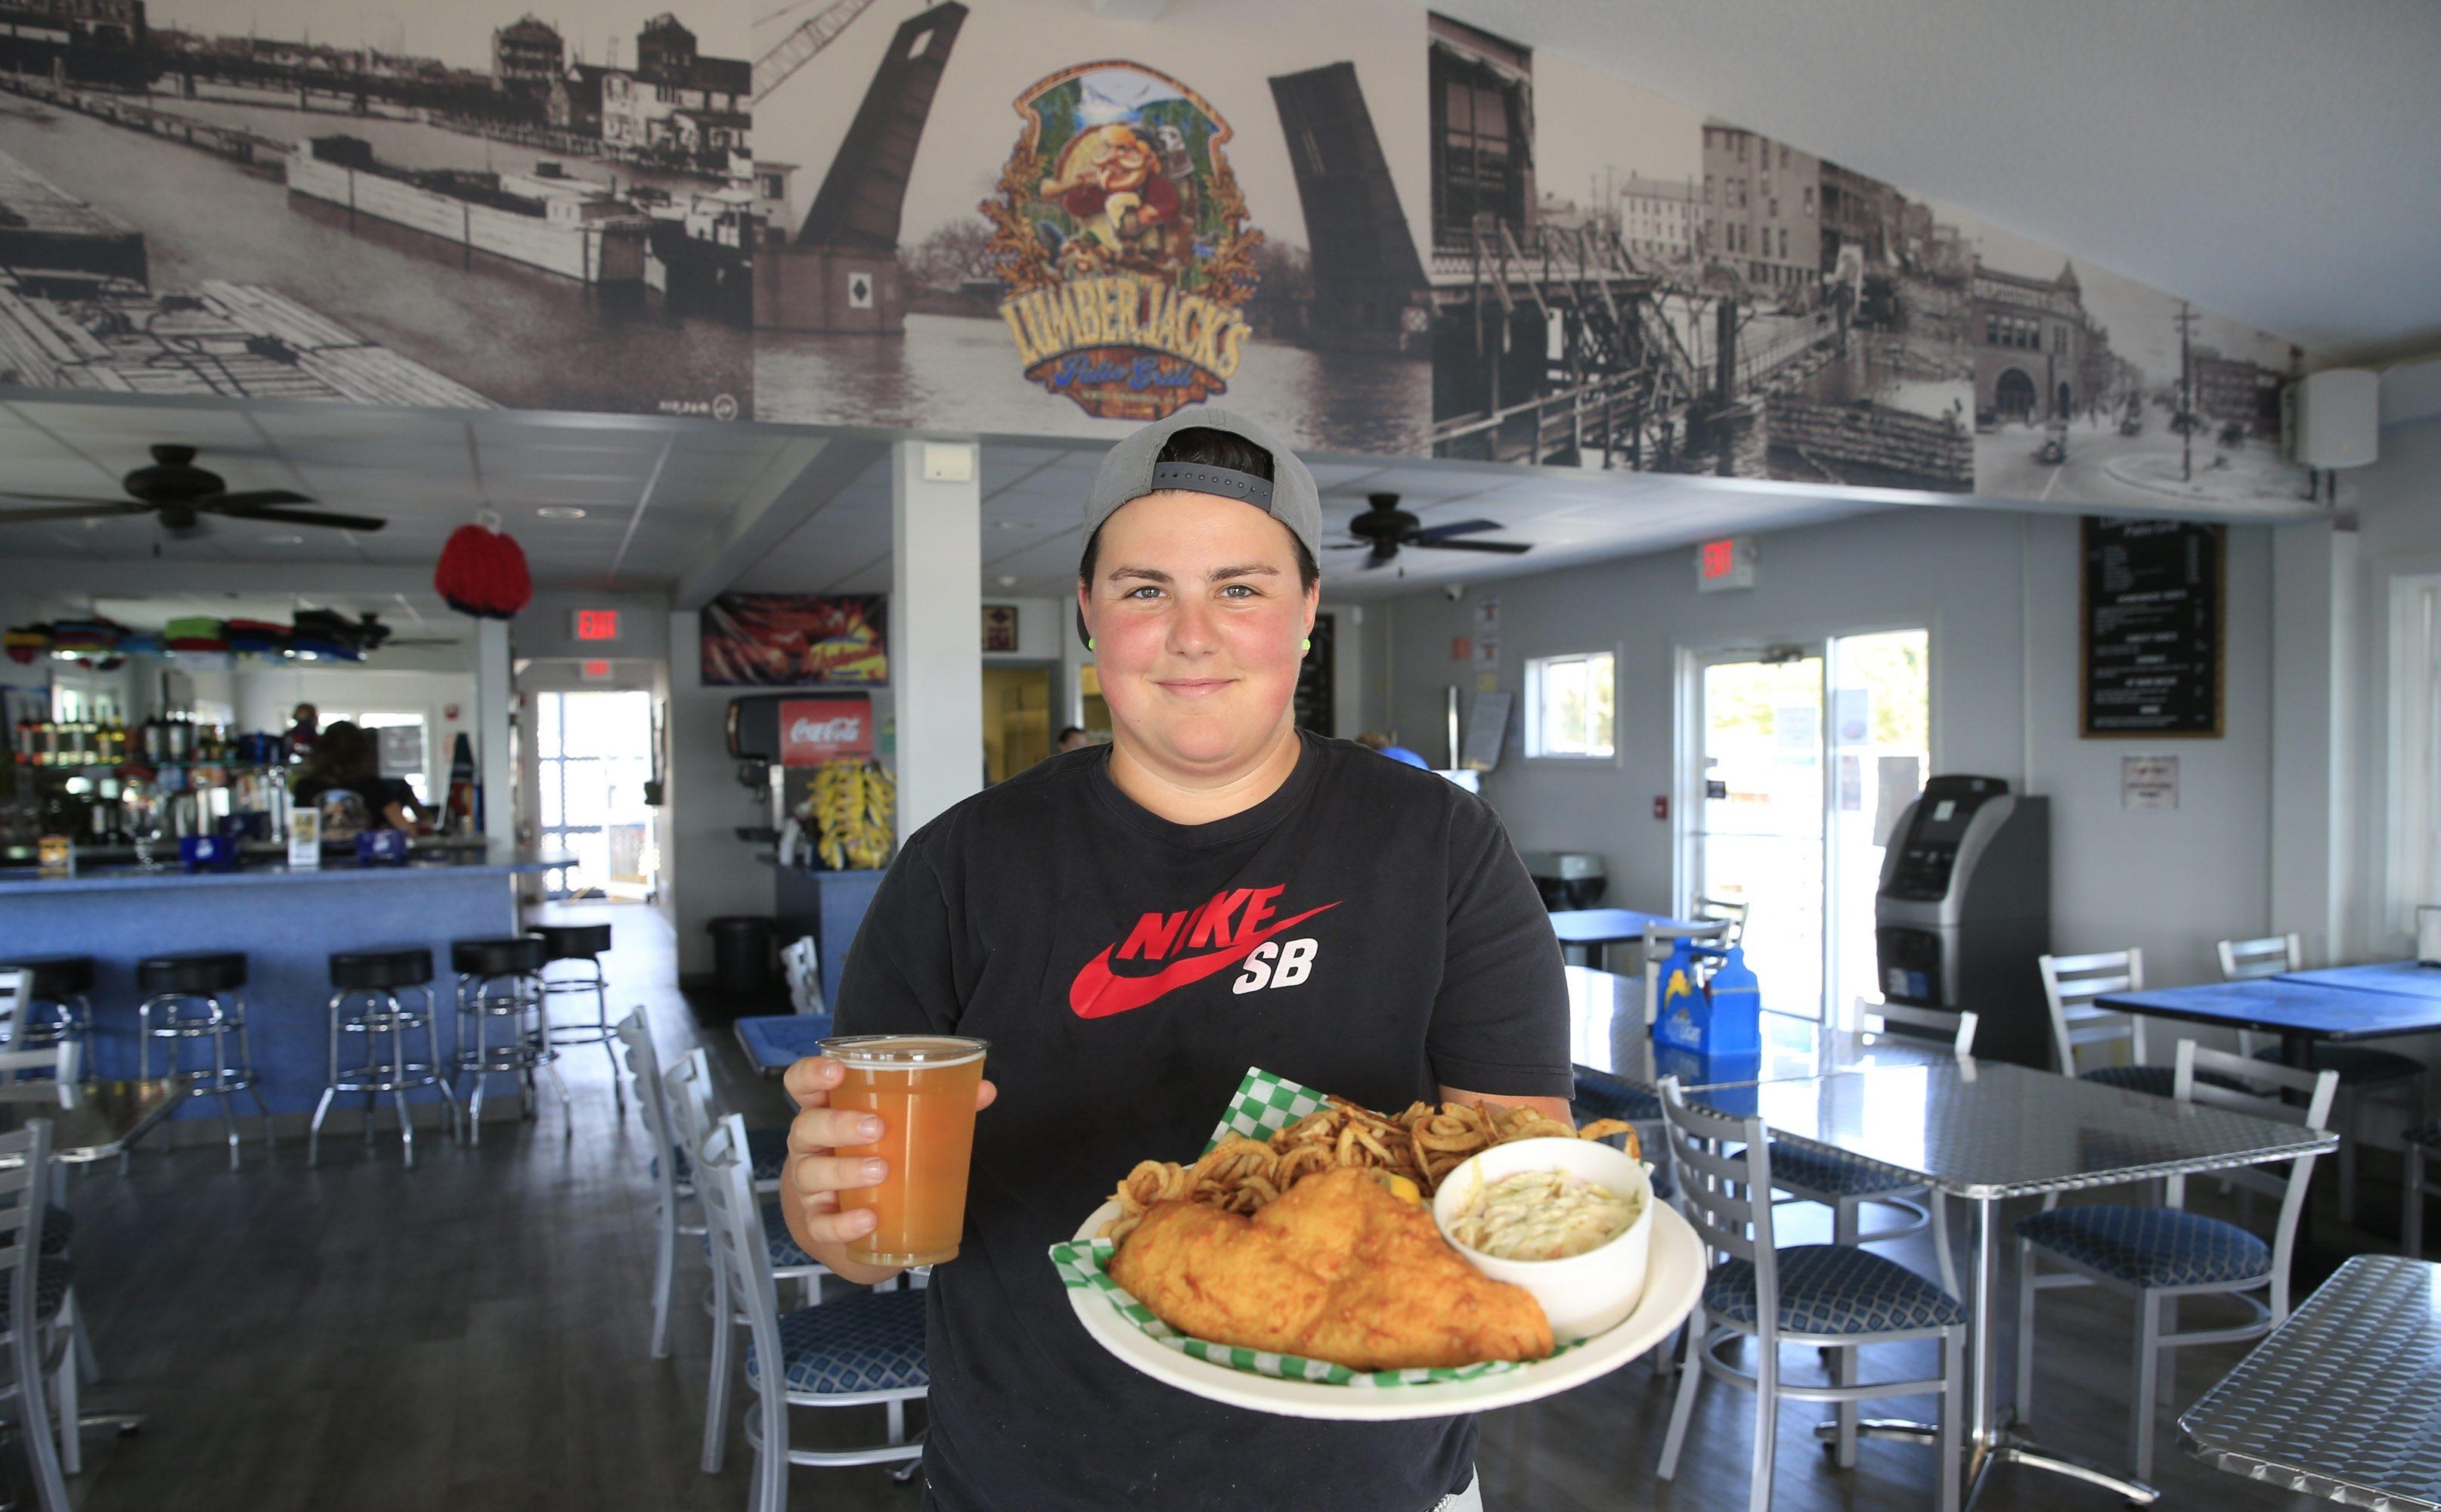 Shaina Bunker holds the everyday fish fry and a draft beer at Lumberjack's in North Tonawanda. (Harry Scull Jr./Buffalo News)